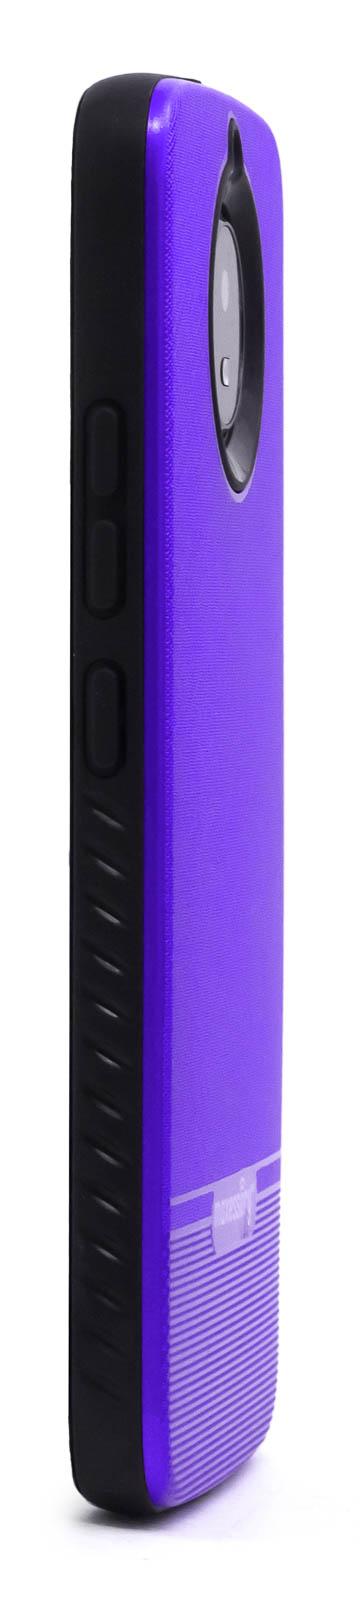 Moto-G5s-Case-Moto-G6-Case-Ultra-Thin-Hard-Body-Tactile-Shell-Cover thumbnail 29